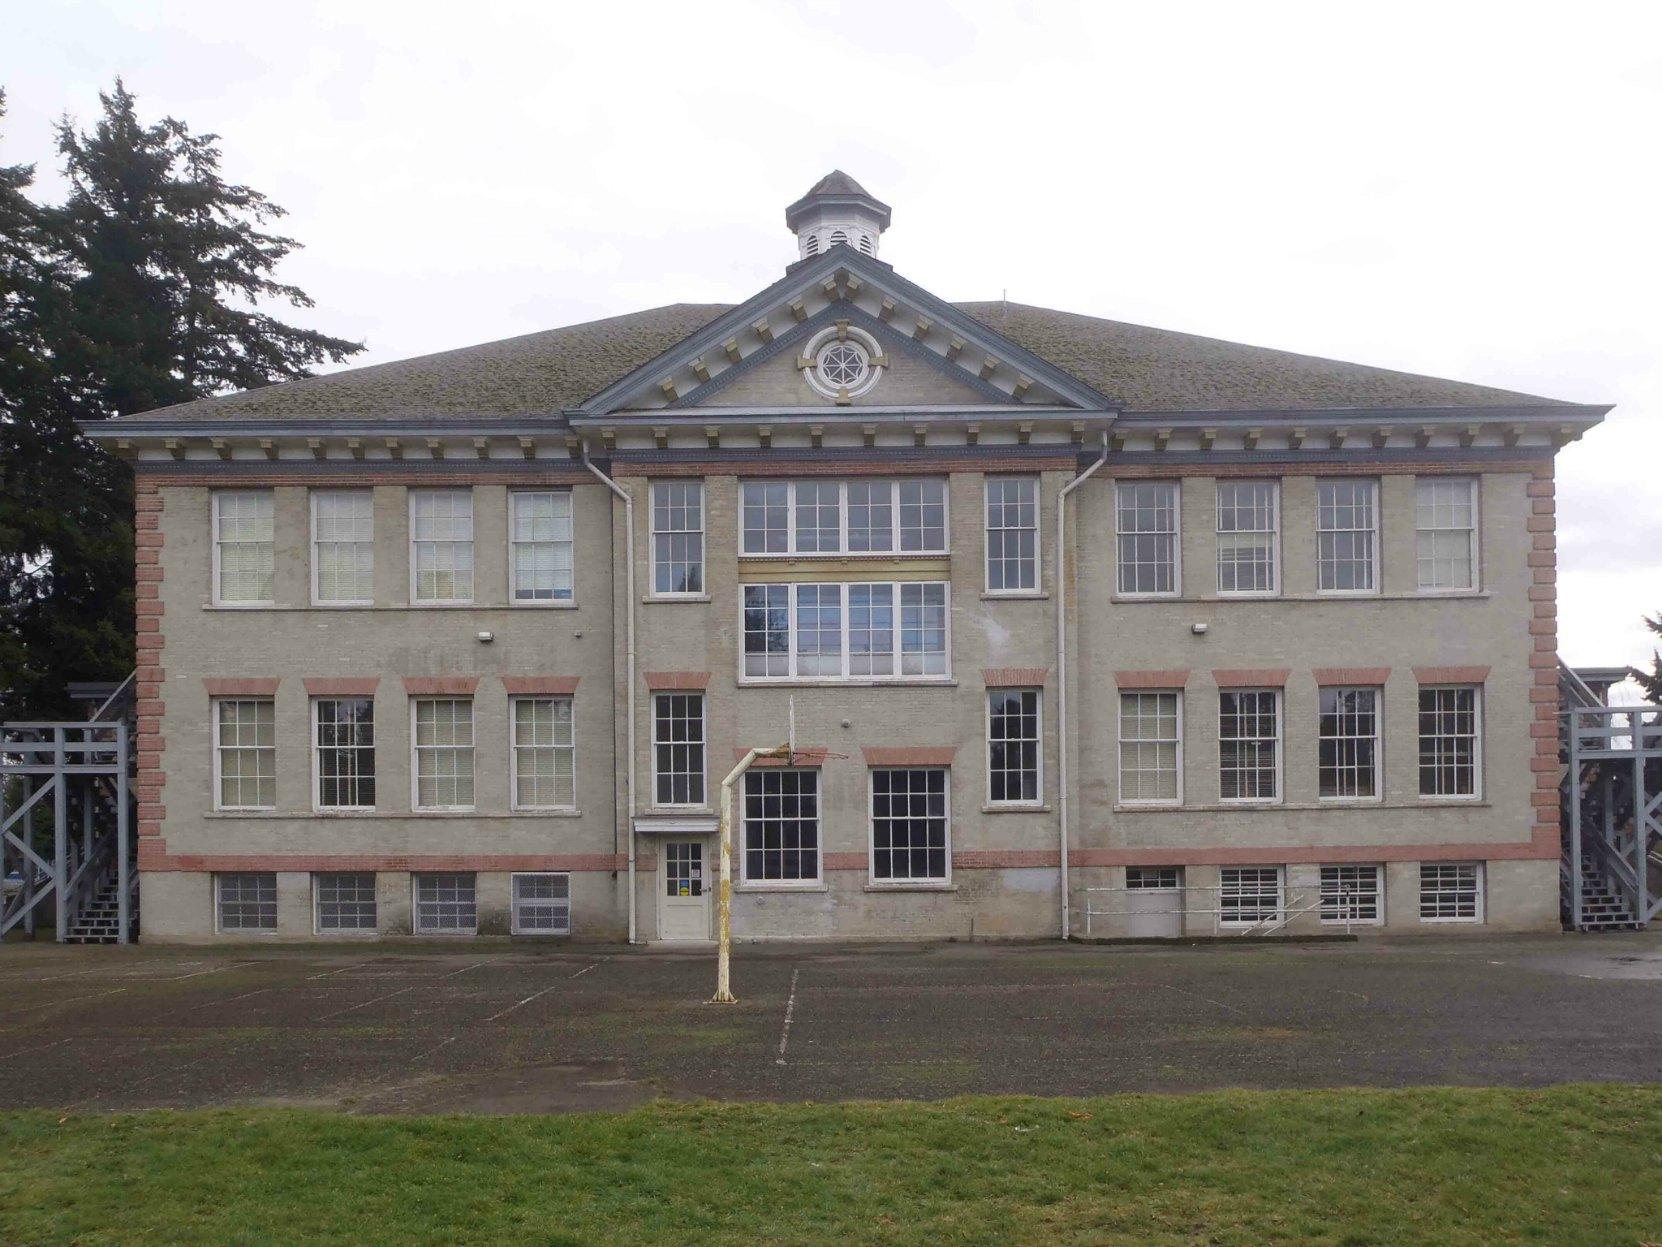 Duncan Elementary School, rear elevation.